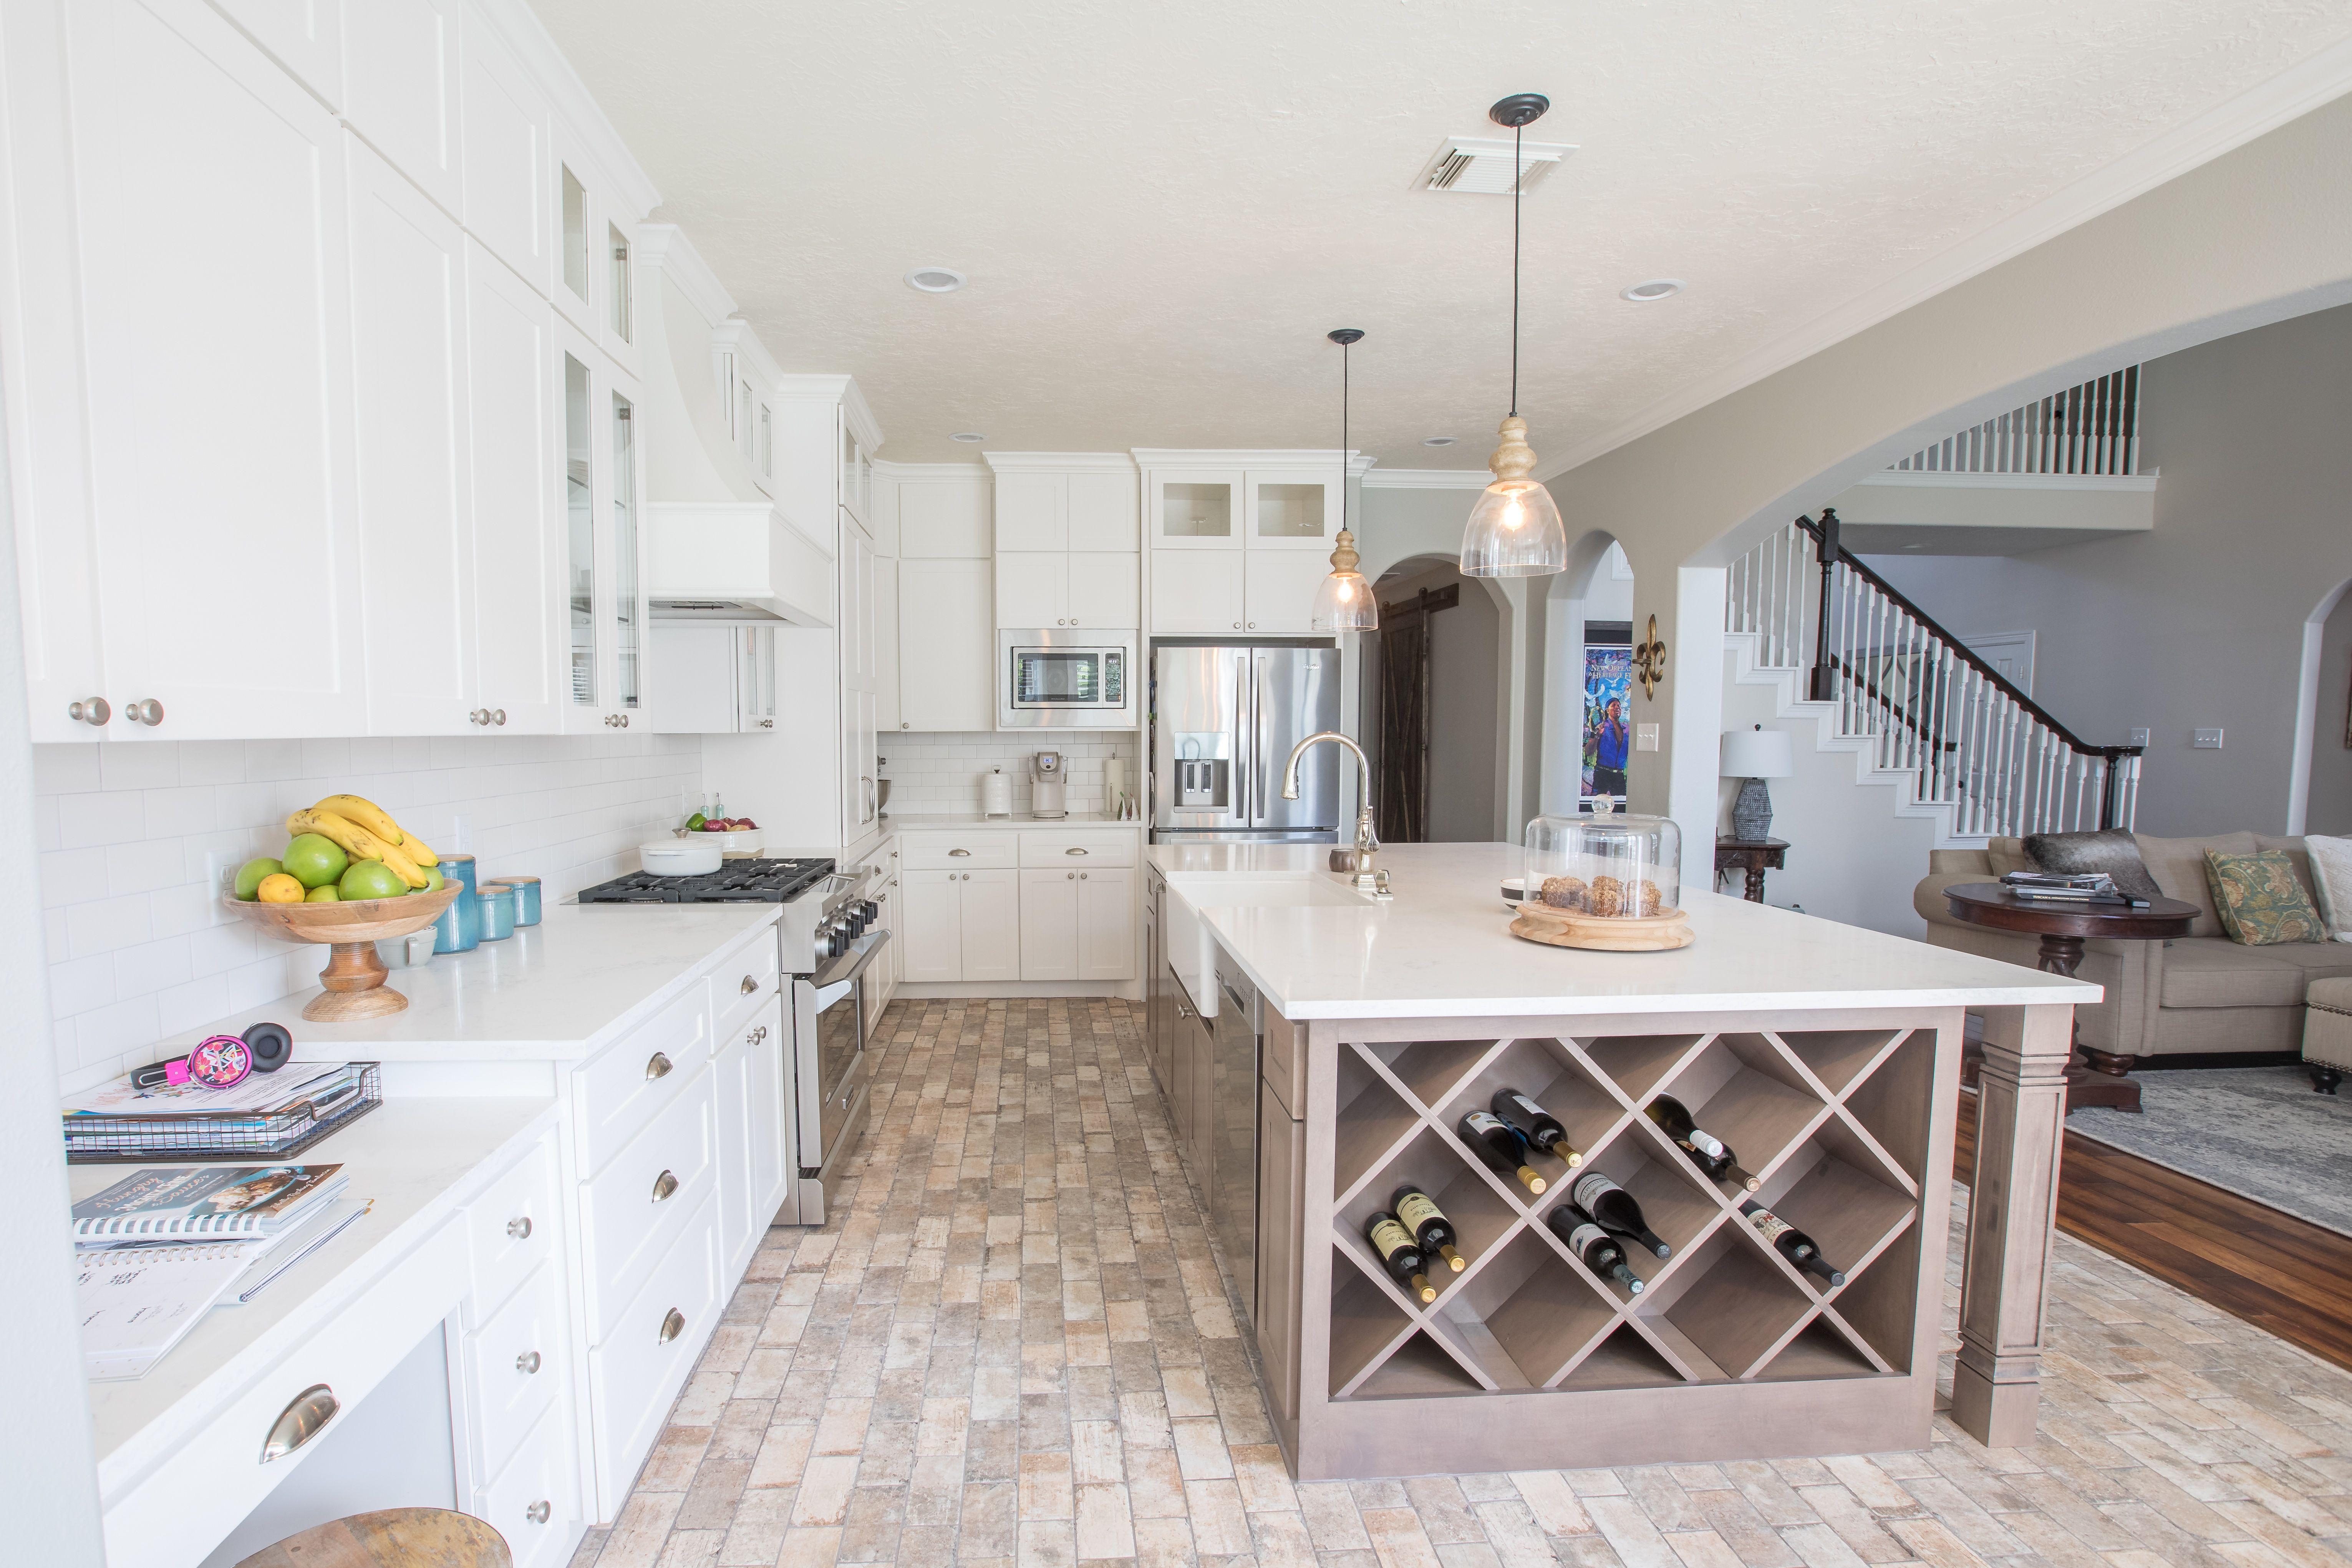 Kitchen Remodel - Chicago Southside Flooring, Quartz ...